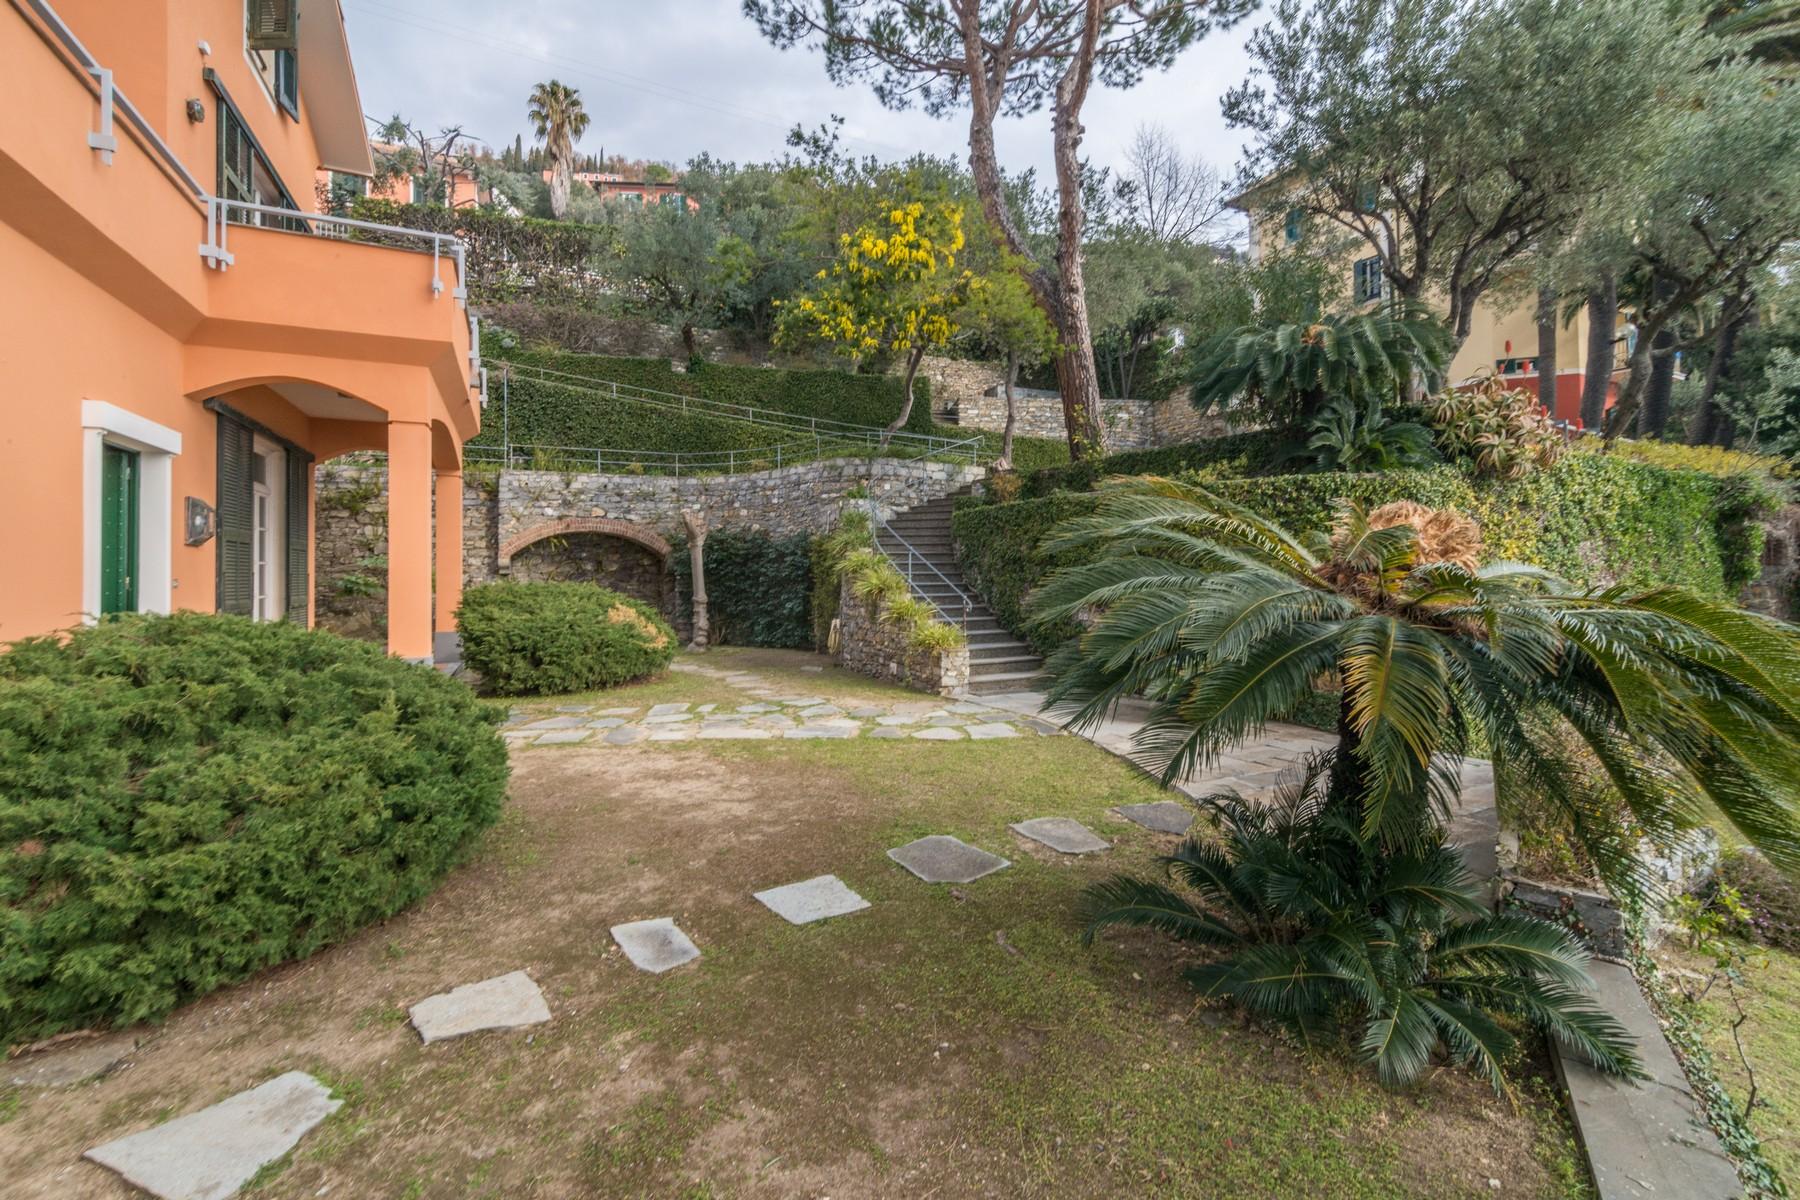 Villa in Vendita a Sori: 5 locali, 720 mq - Foto 3